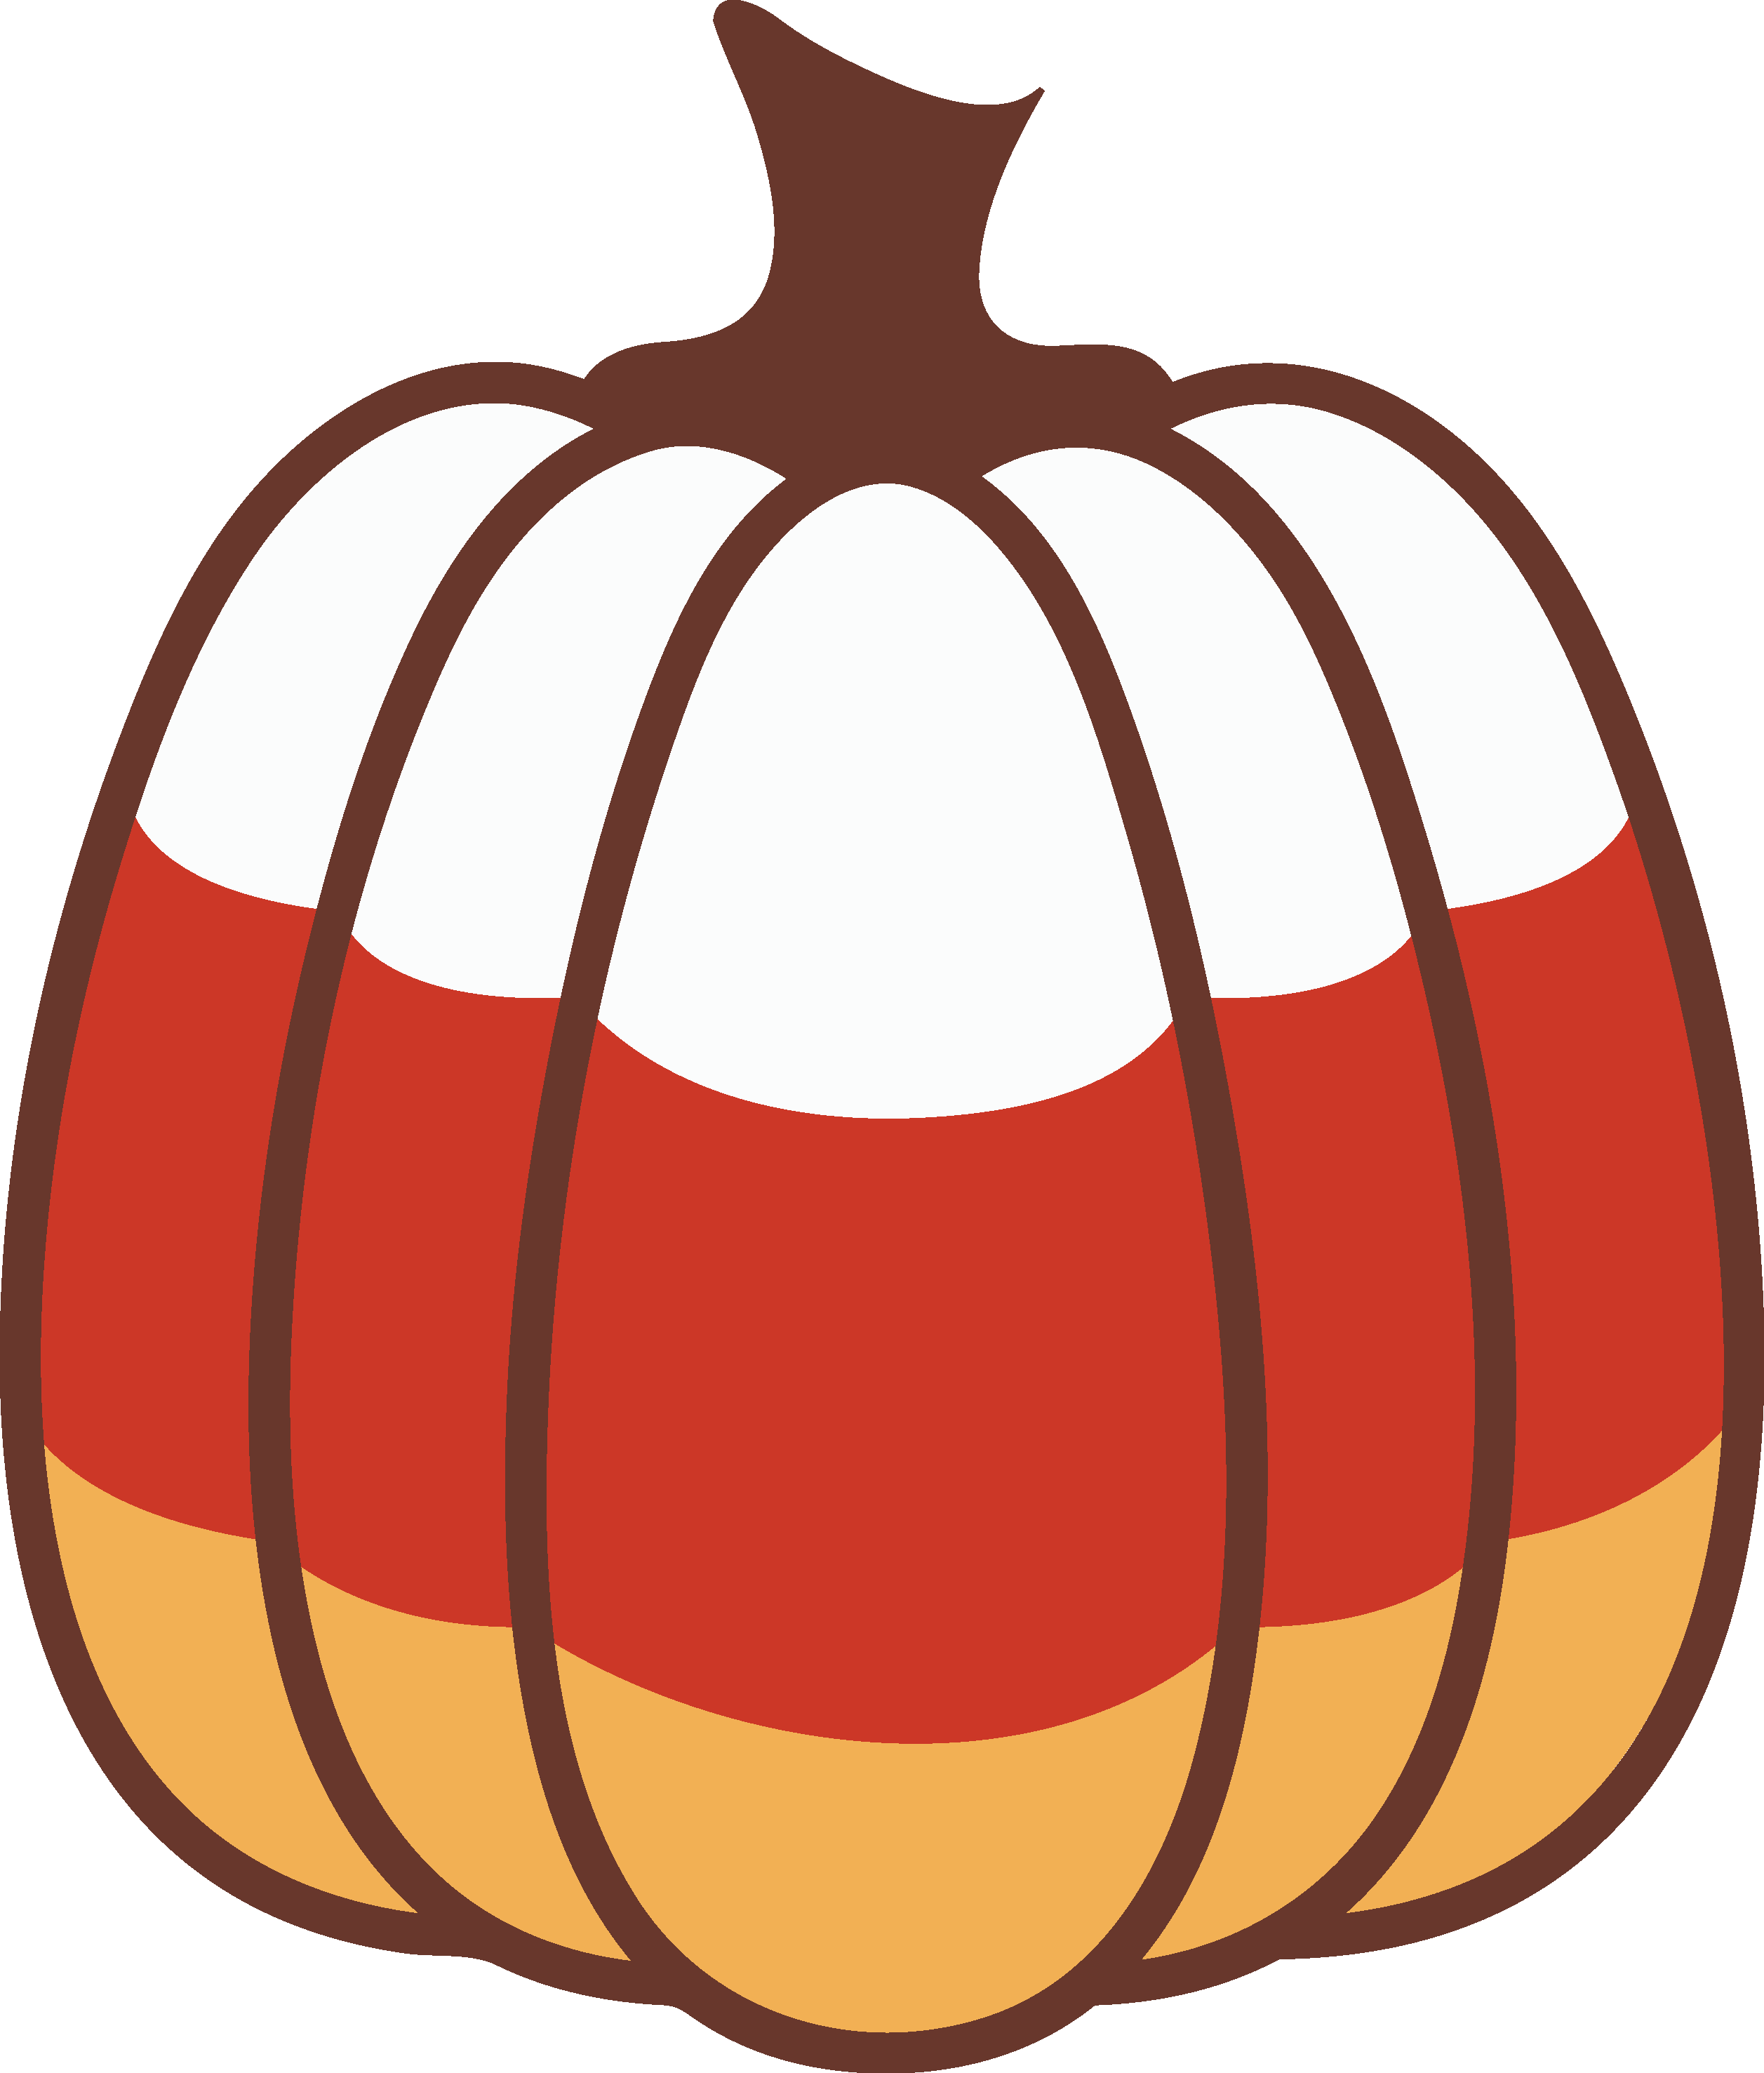 Pumpkin silhouette clipart clip royalty free download Halloween clip royalty free download